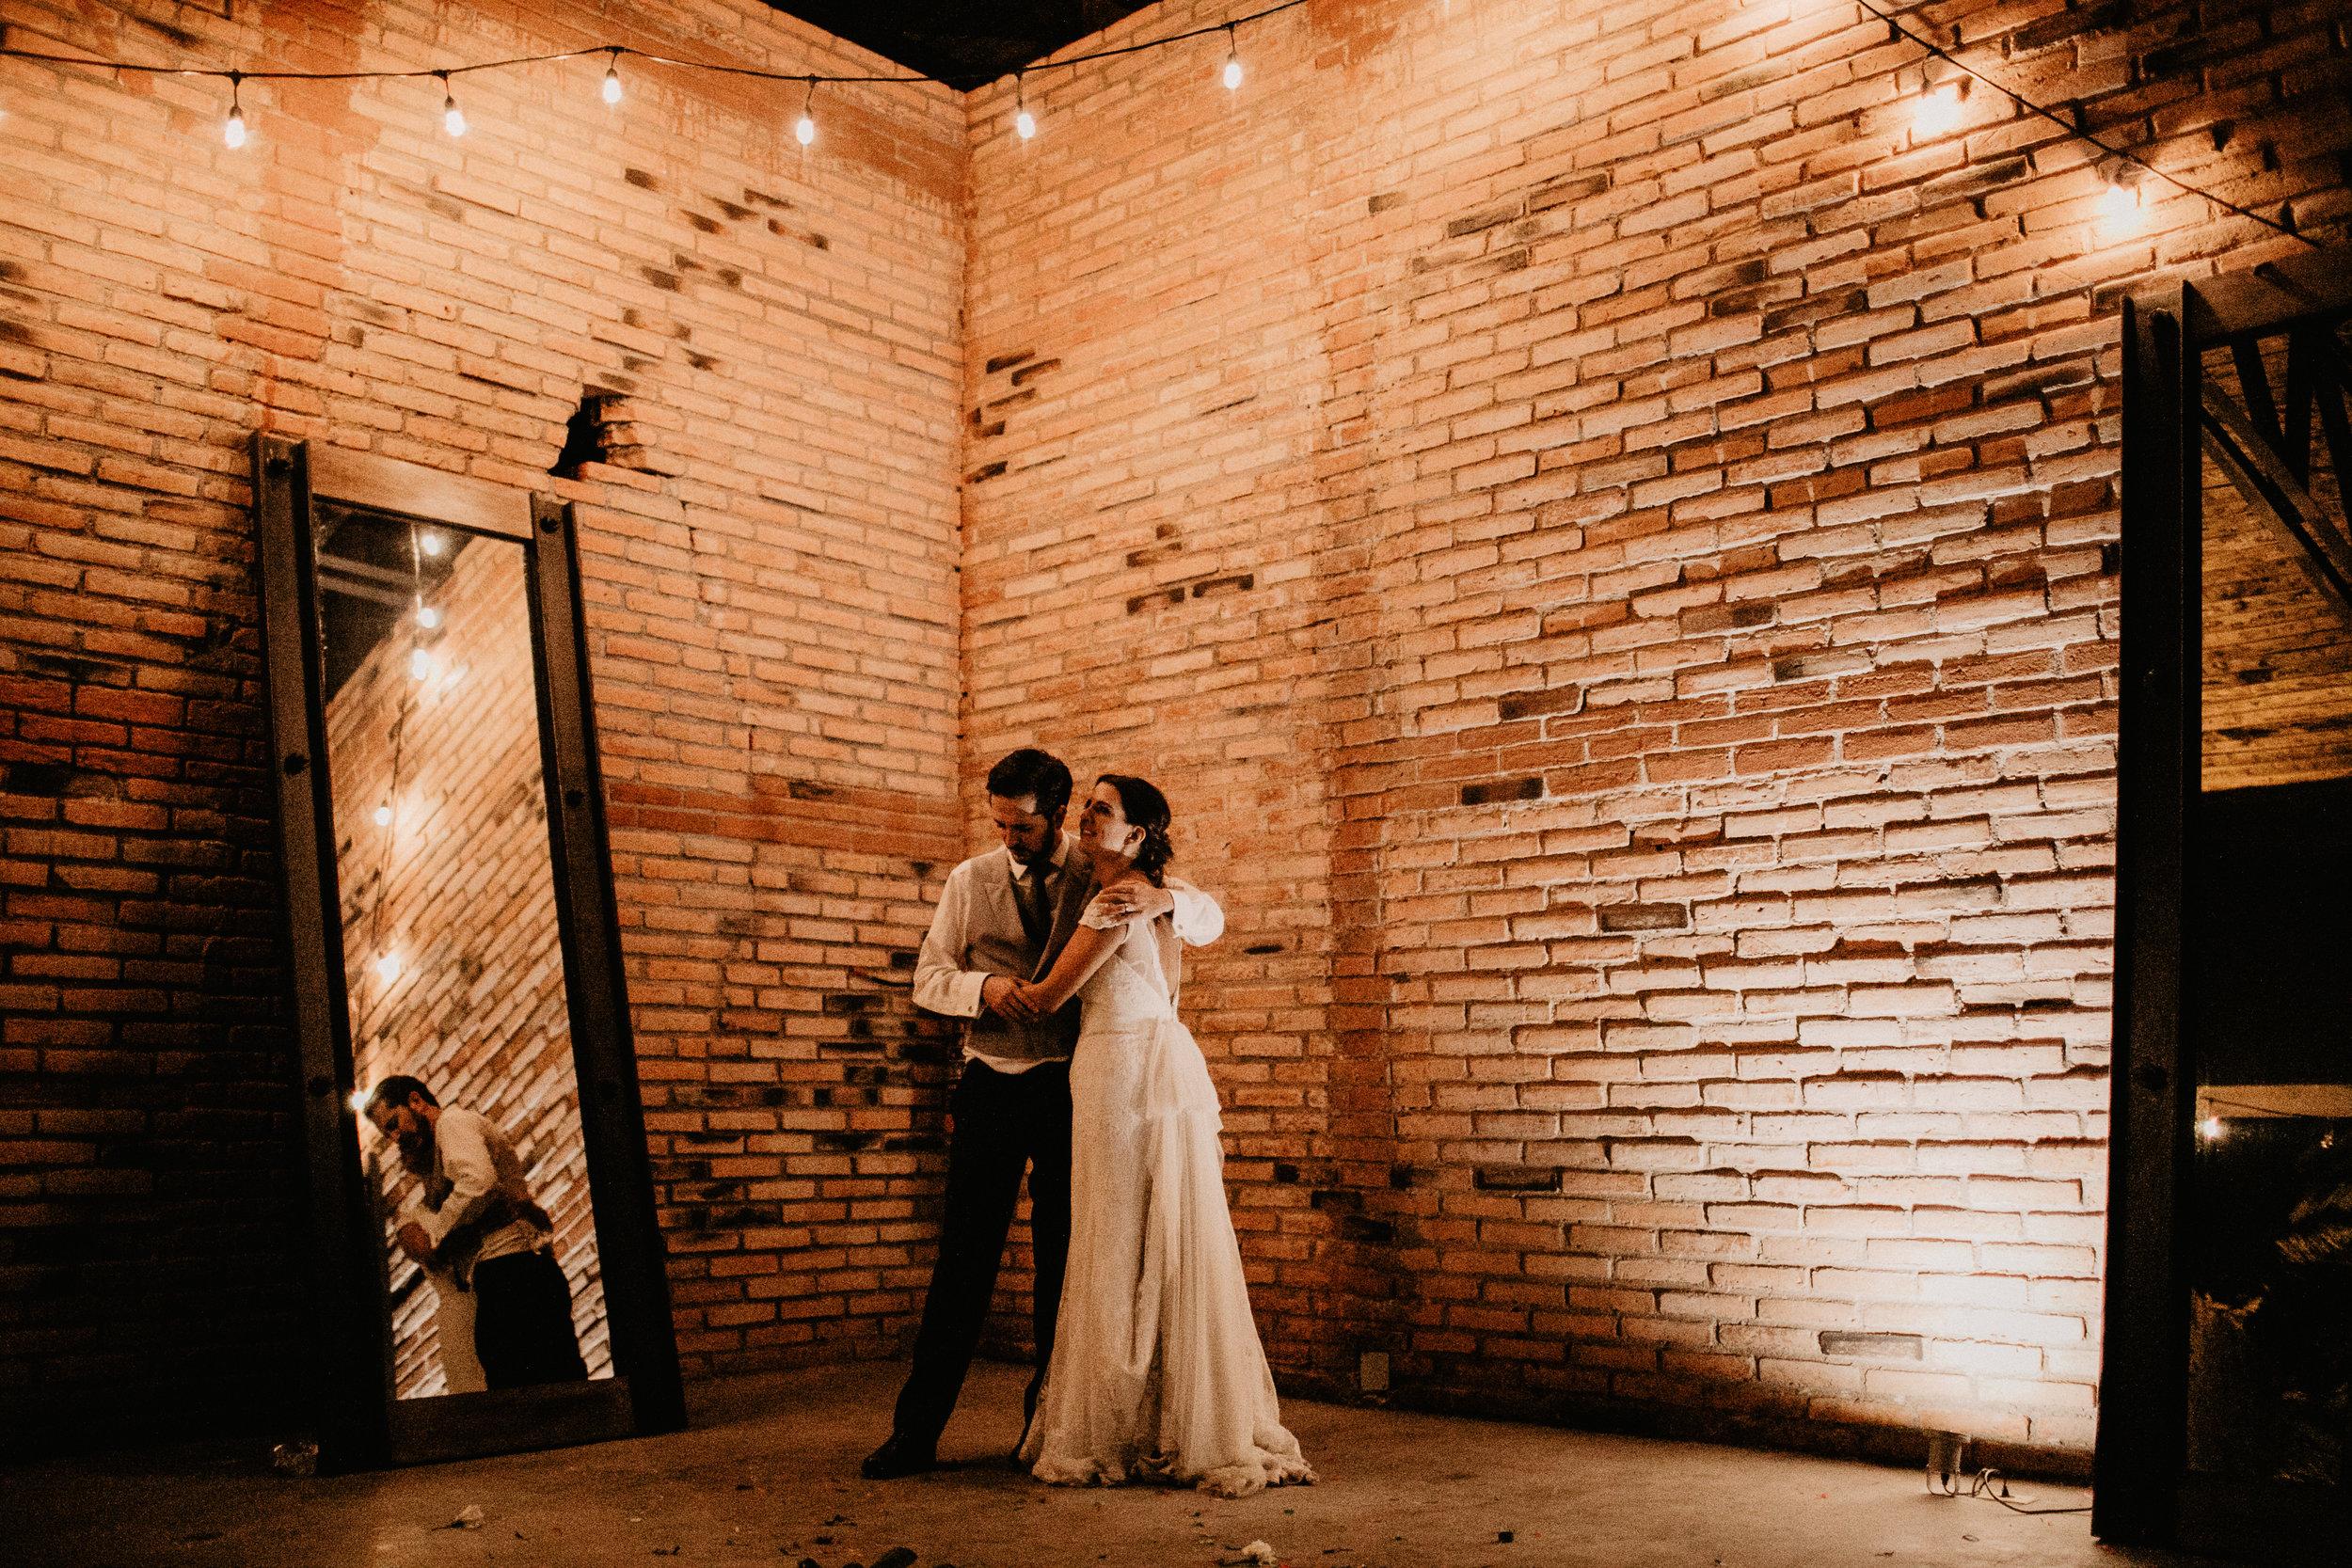 alfonso_flores_destination_wedding_photographer_pau_alonso_1409.JPG